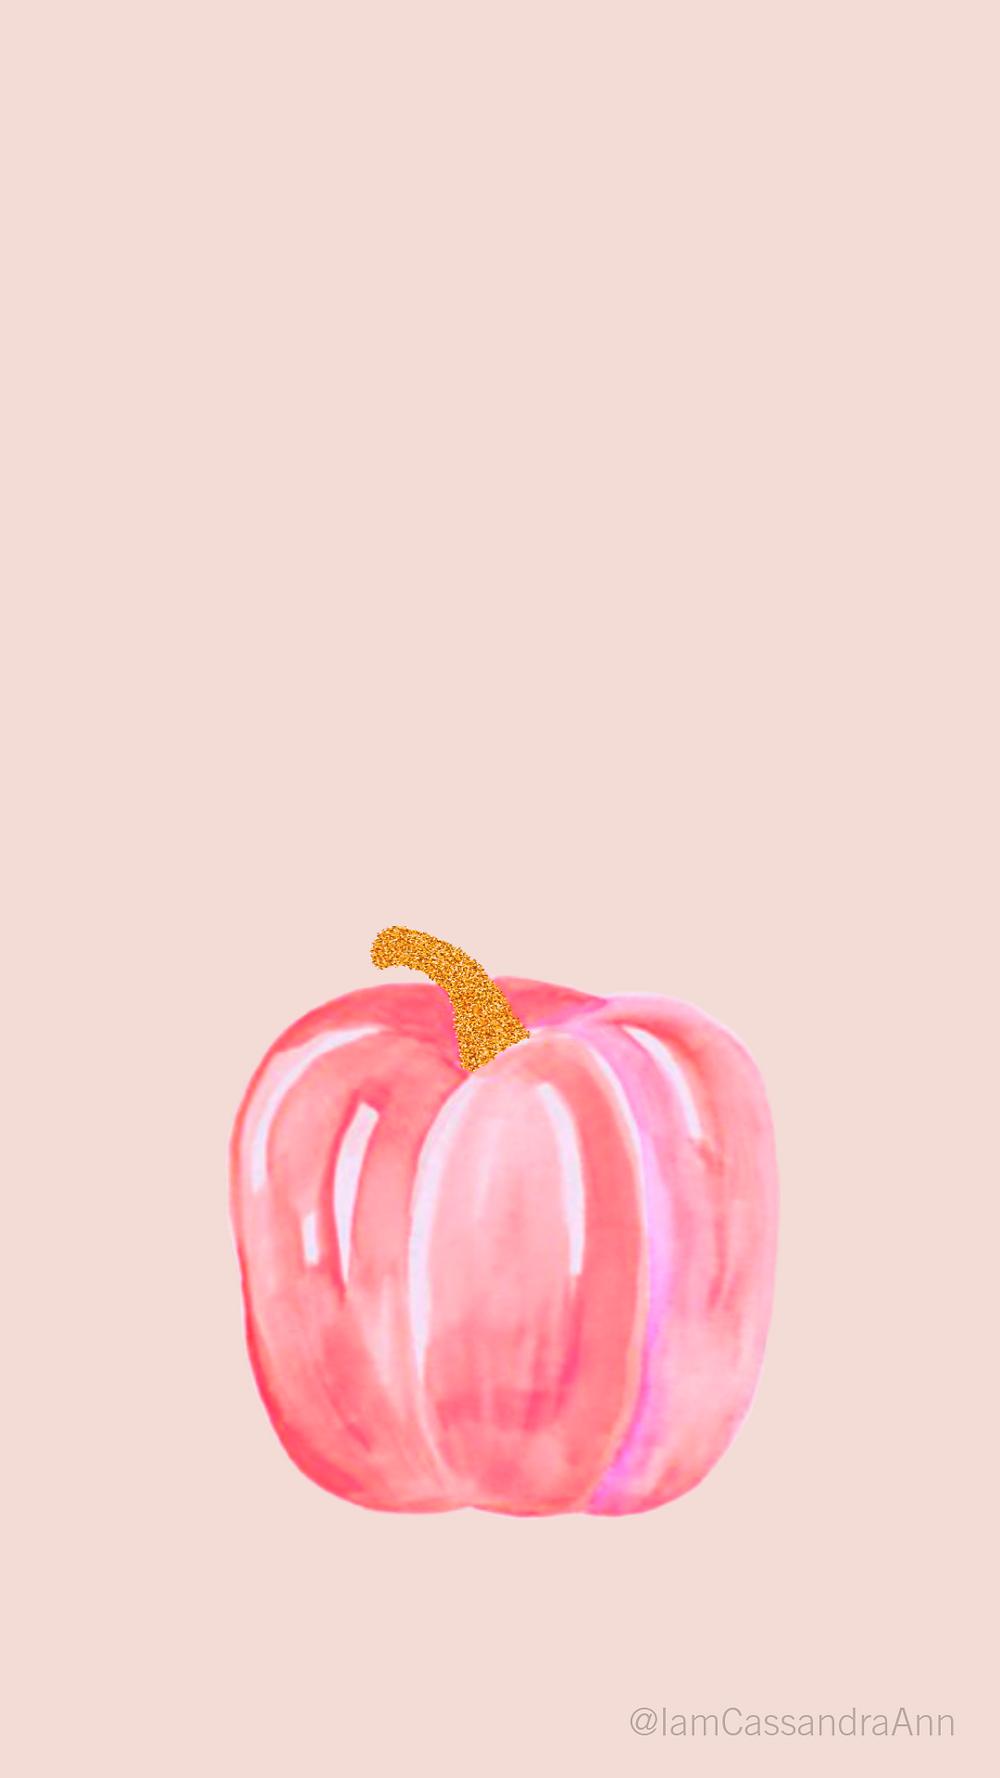 2019 Fall Wallpaper - Cassandra Ann - Free Fall Phone Backgrounds - October Phone Backgrounds